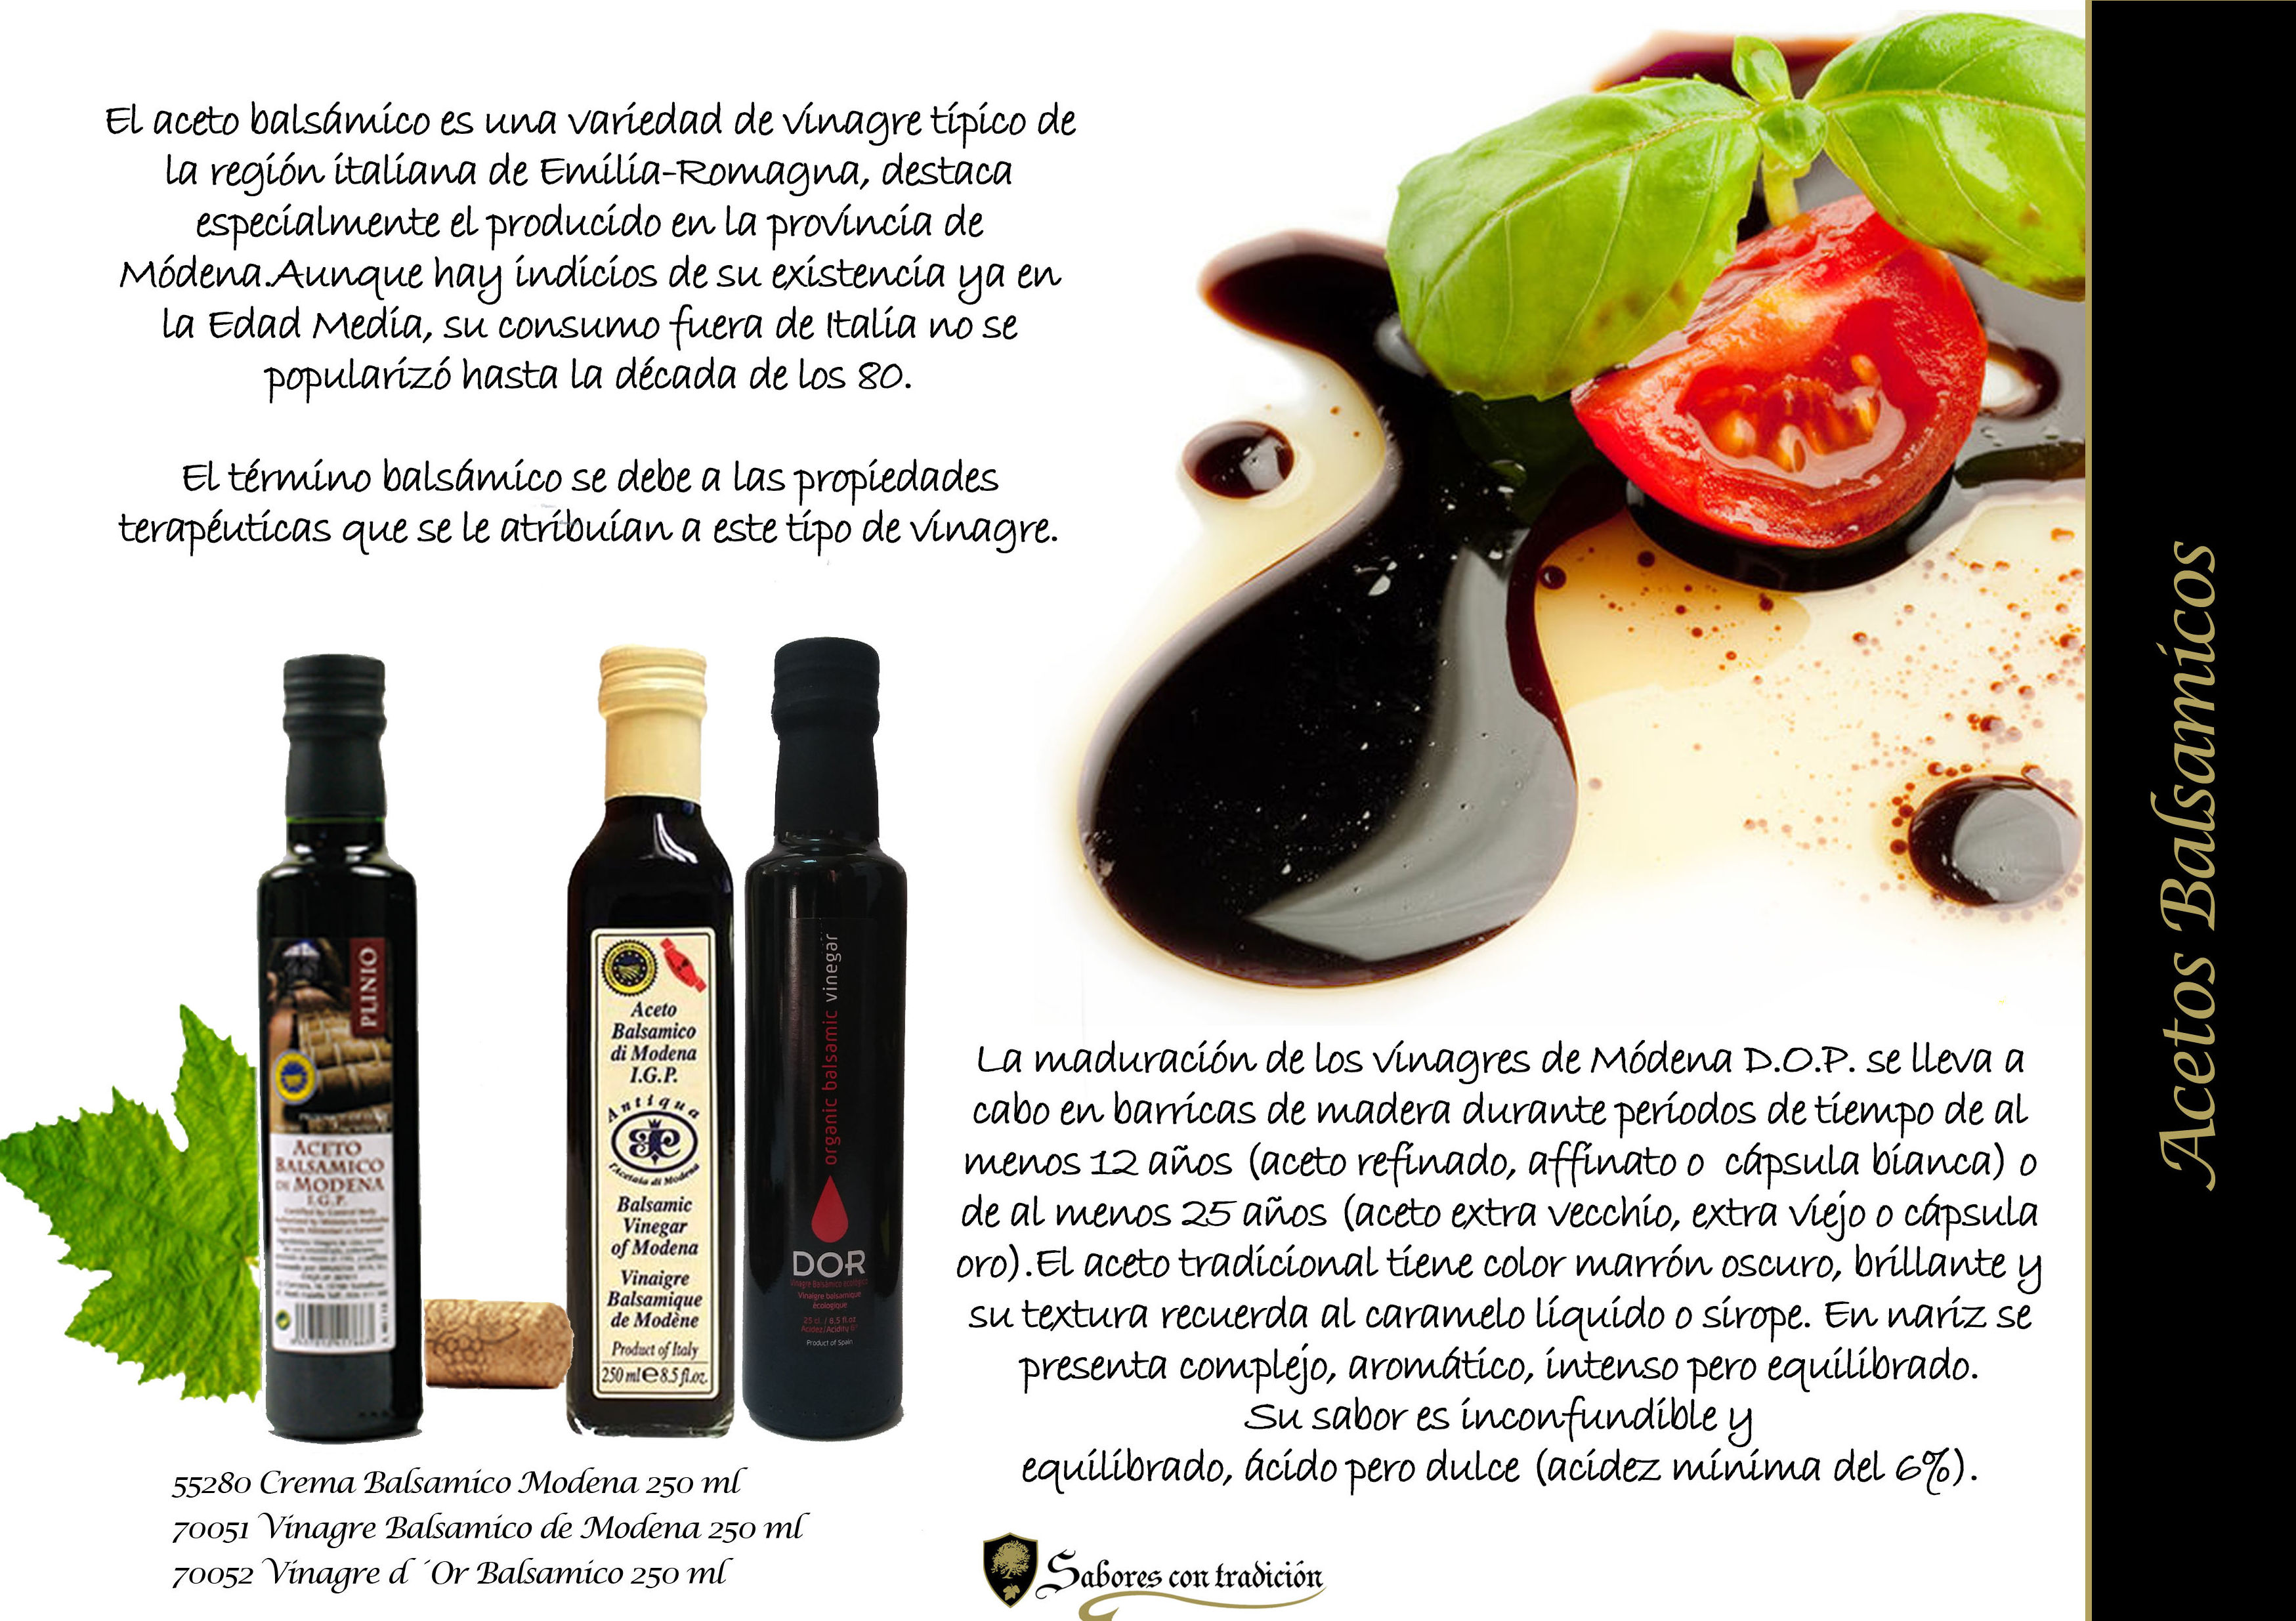 Acetos balsamicos: Productos de Sabores con tradición